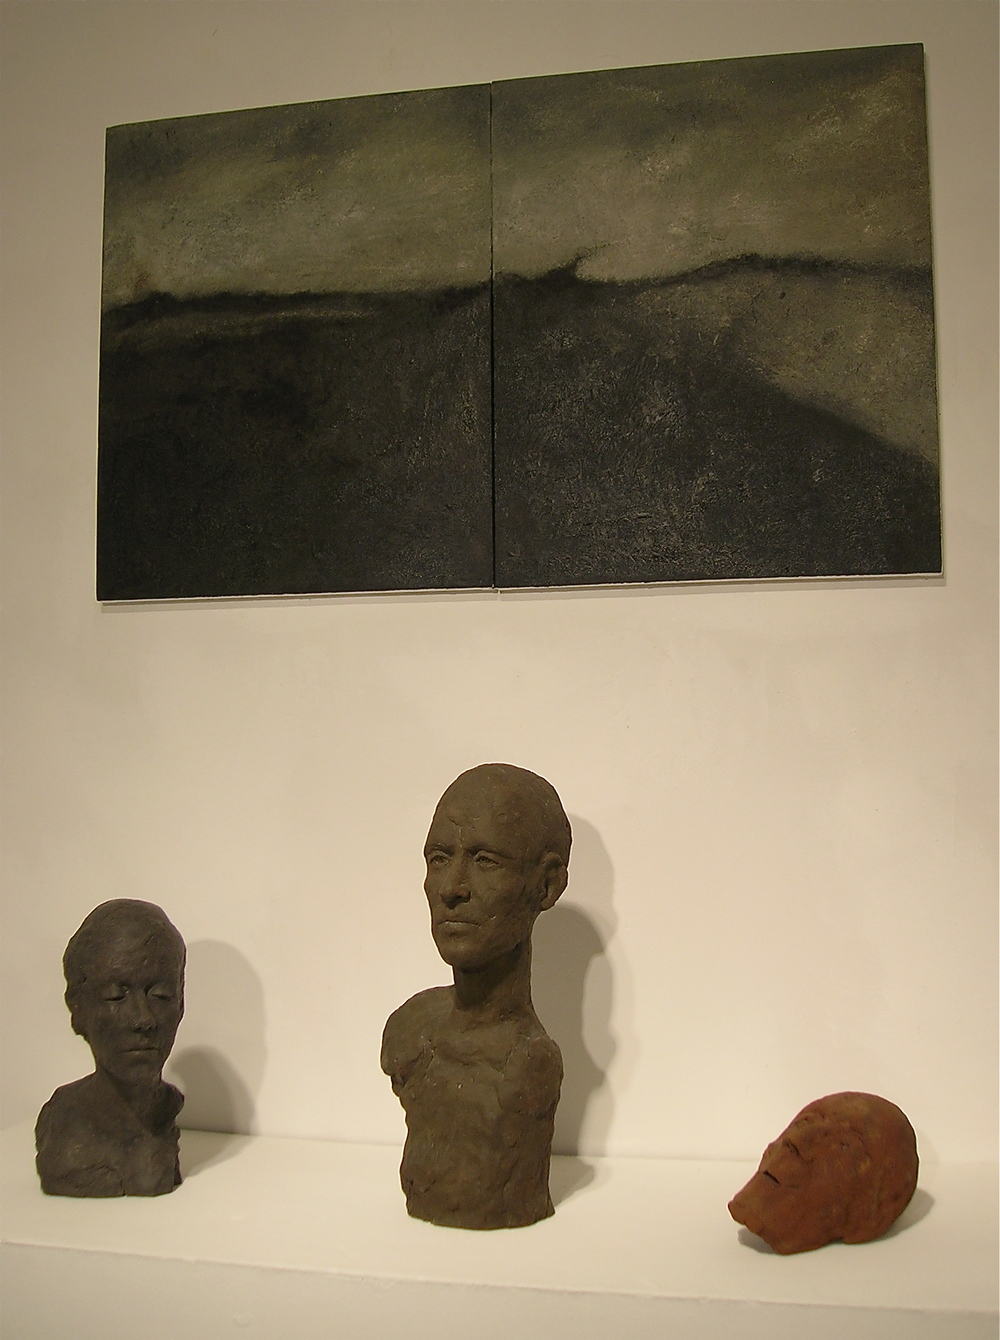 Canal Gallery, Holyoke MA - 2008